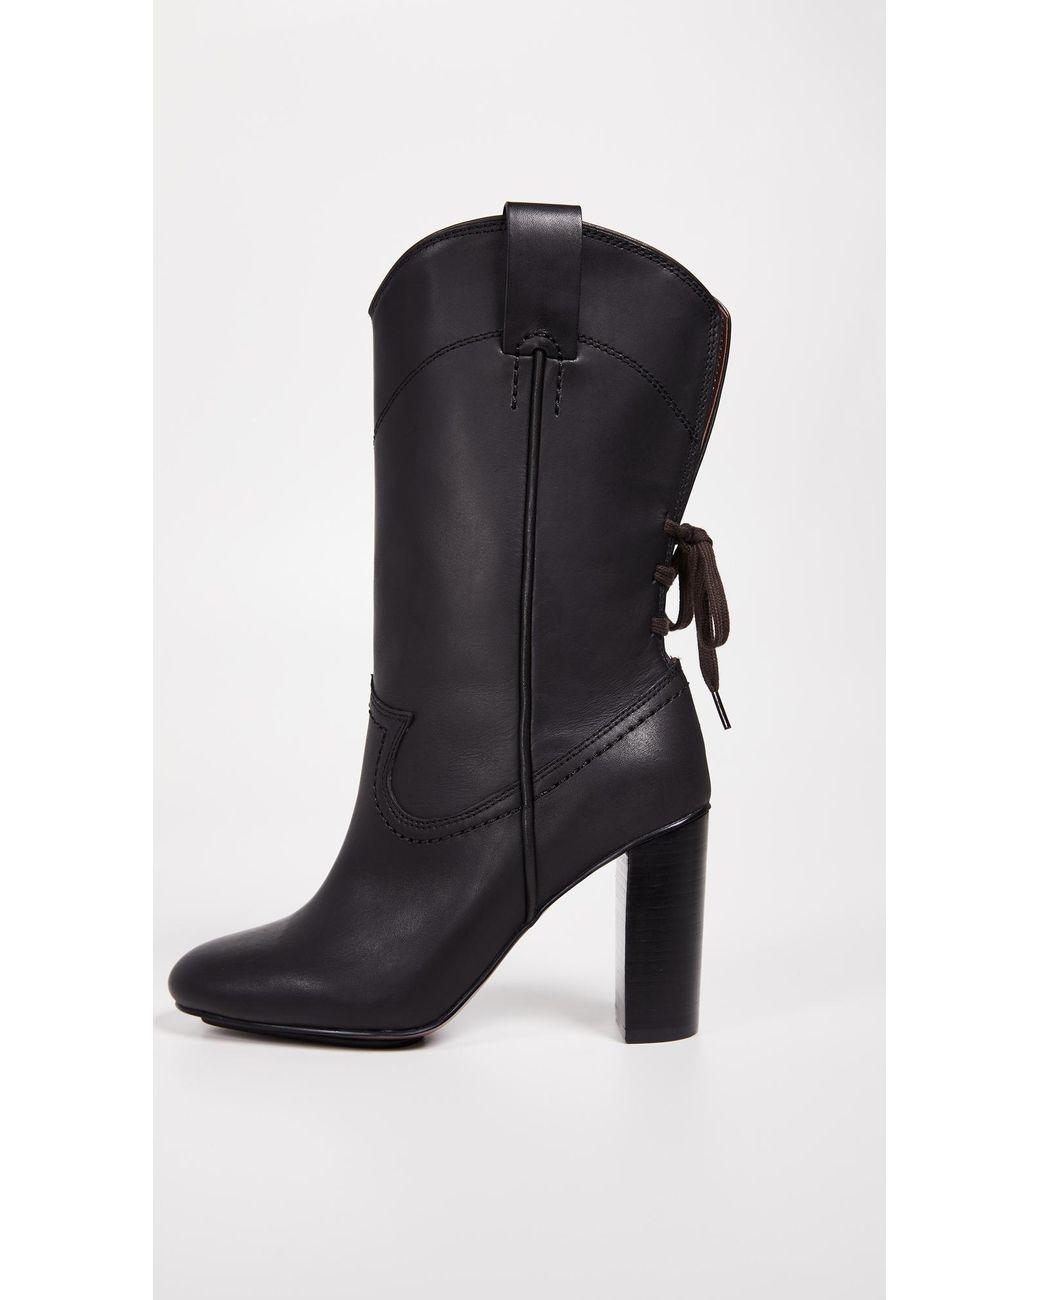 585700e7b8a6 Lyst - See By Chloé Annika High Heel Western Boots in Black